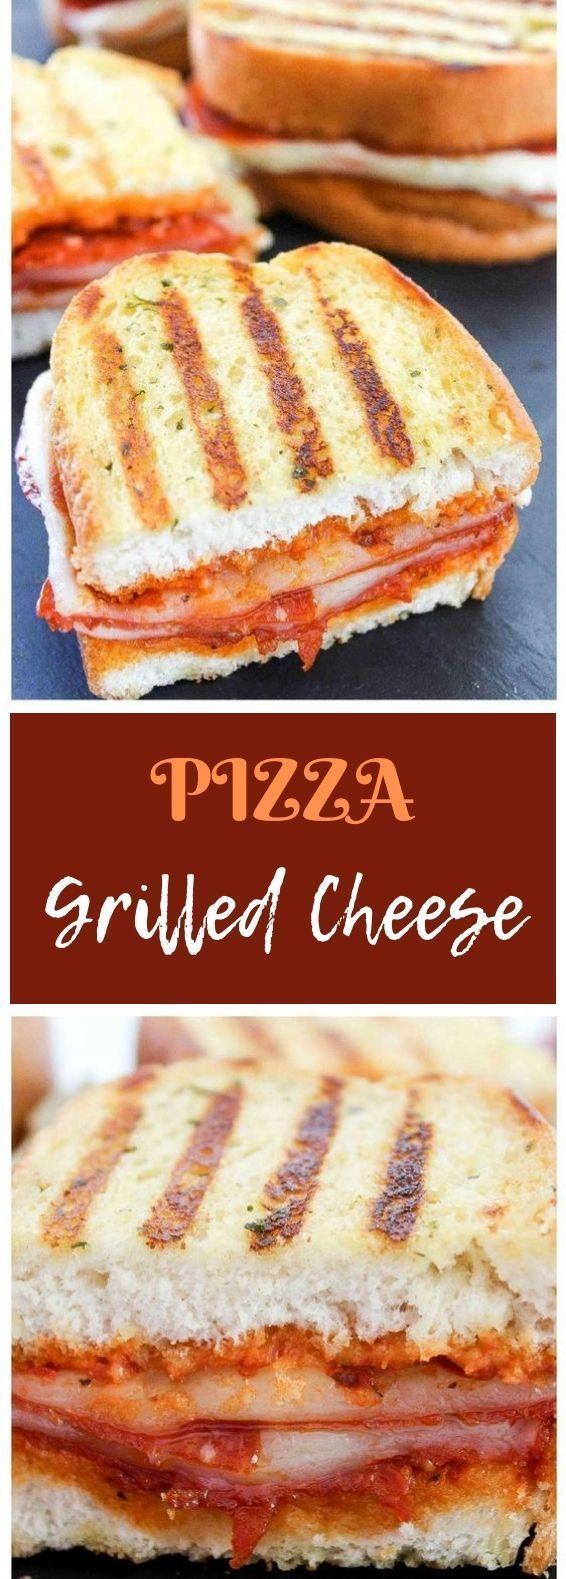 Pepperoni Pizza Gegrillter Käse Pepperoni Pizza Gegrillter Käse